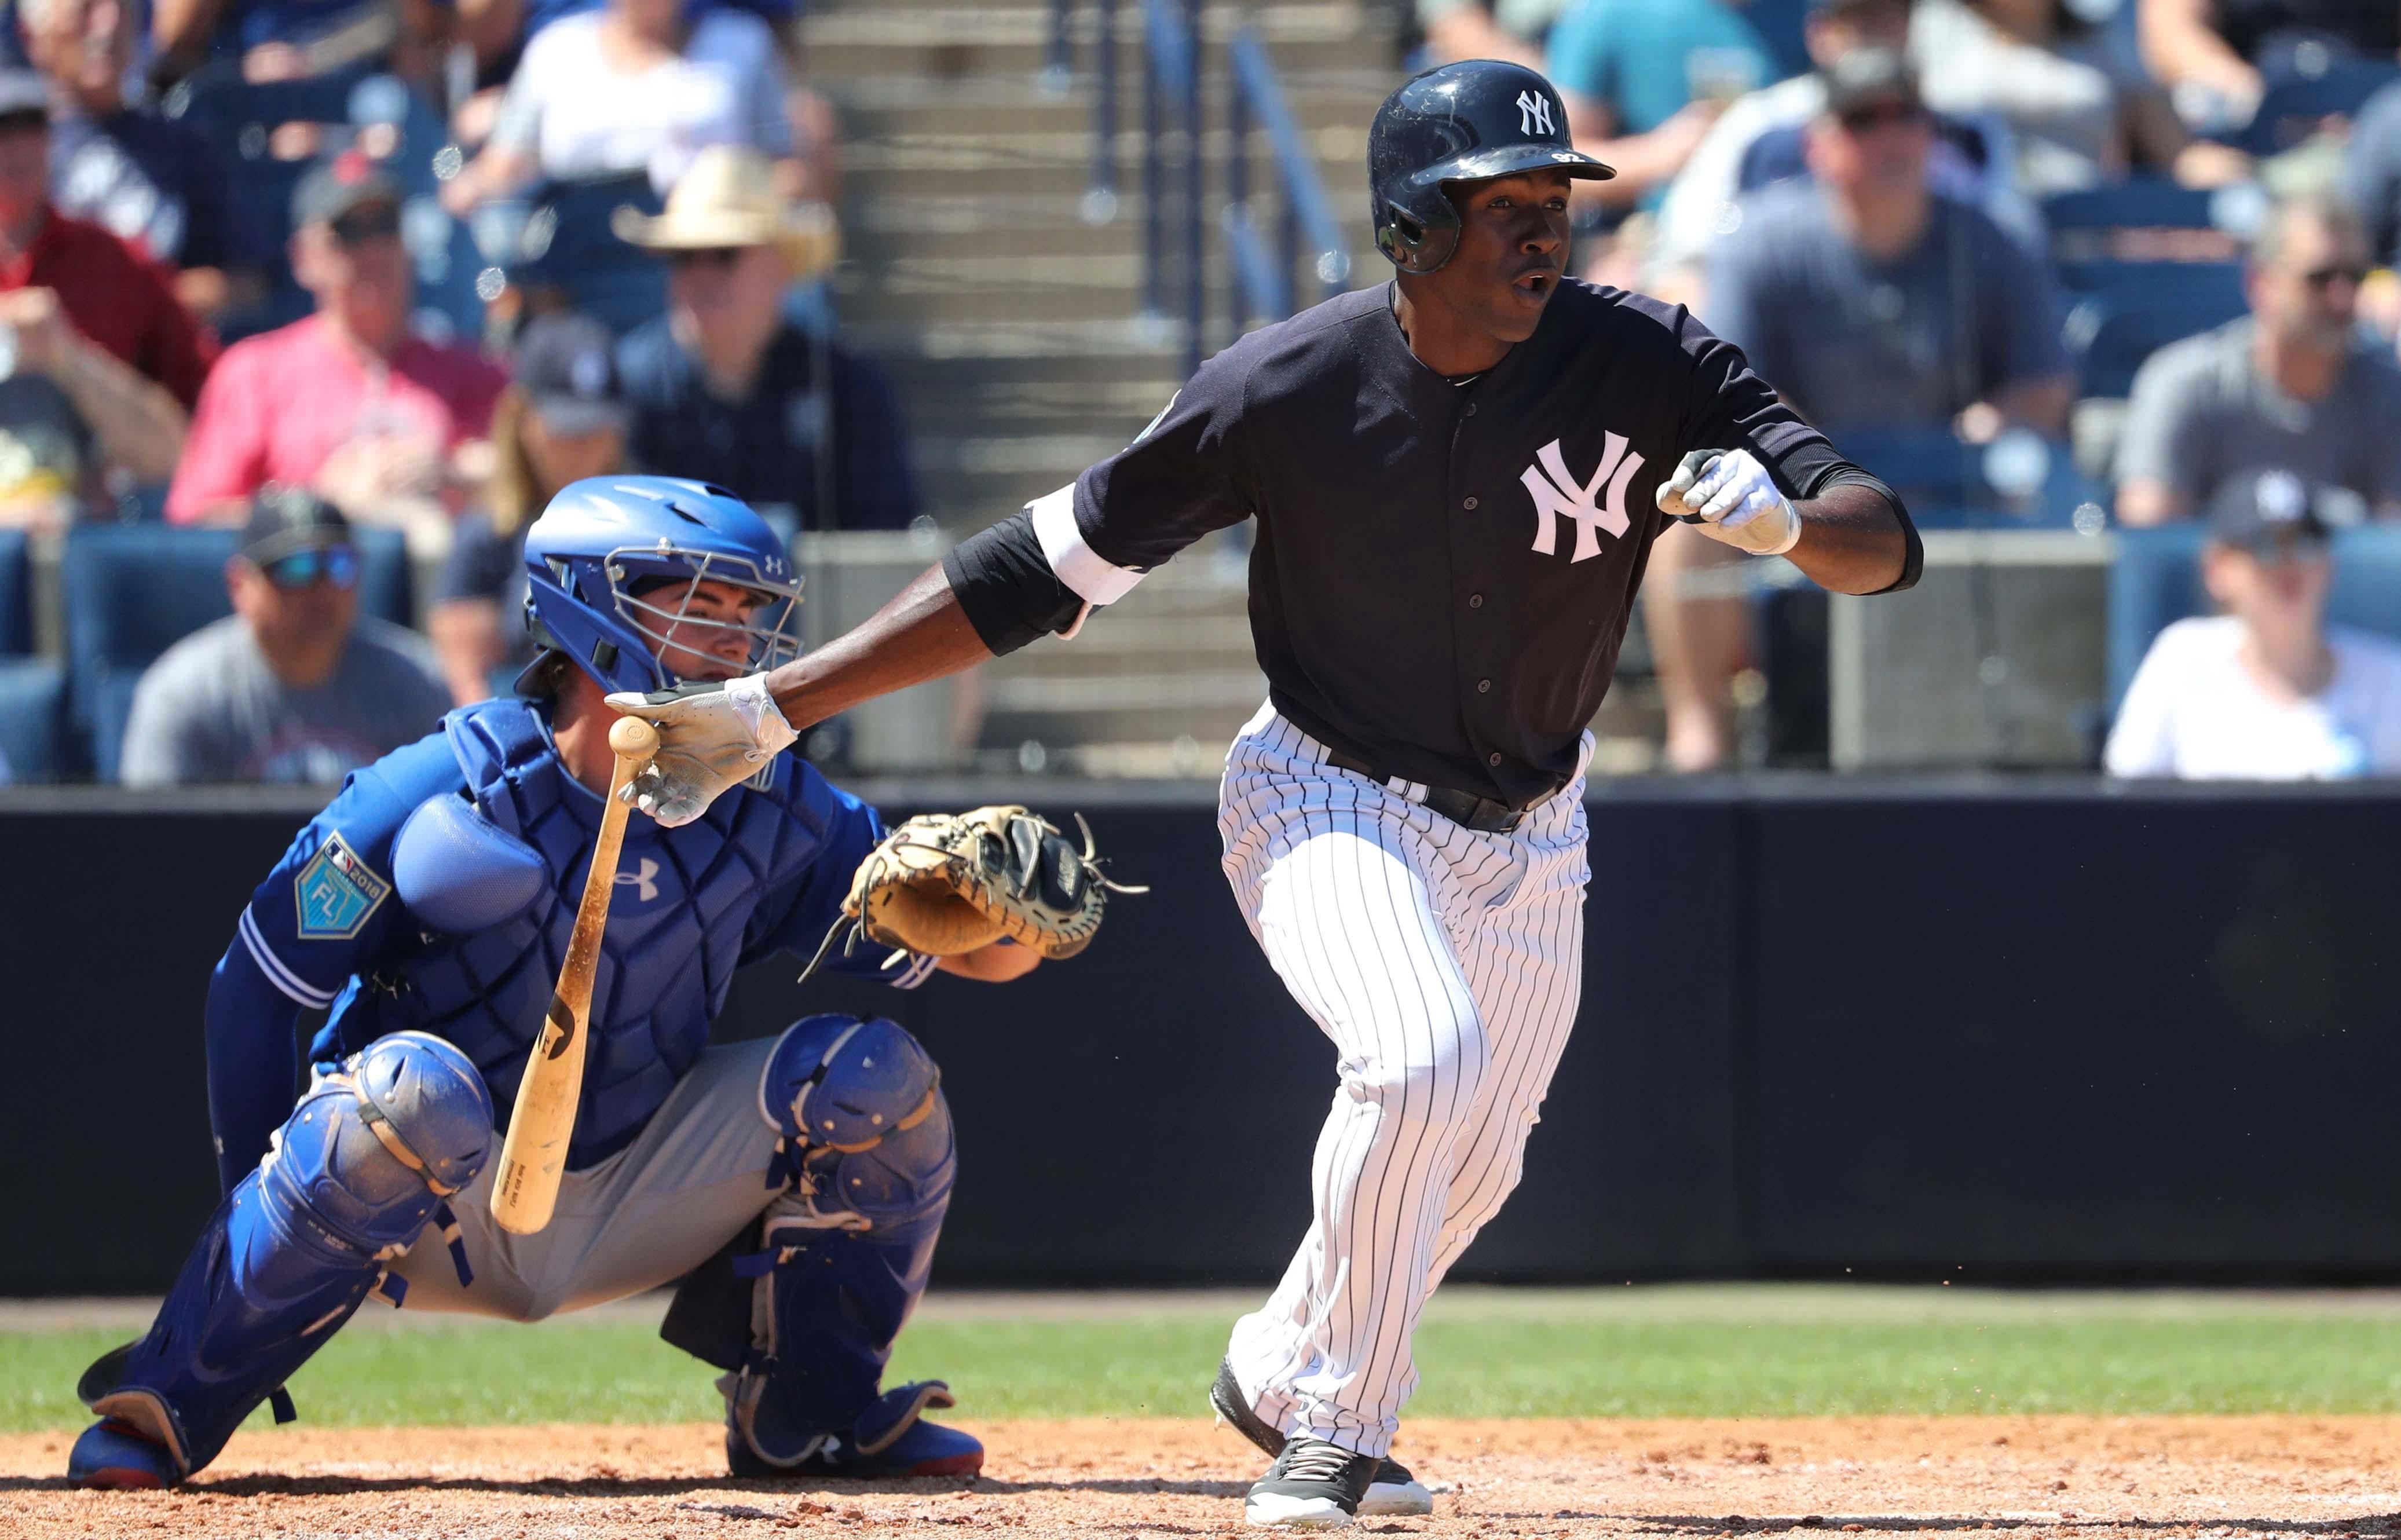 New York Yankees, Estevan Florial